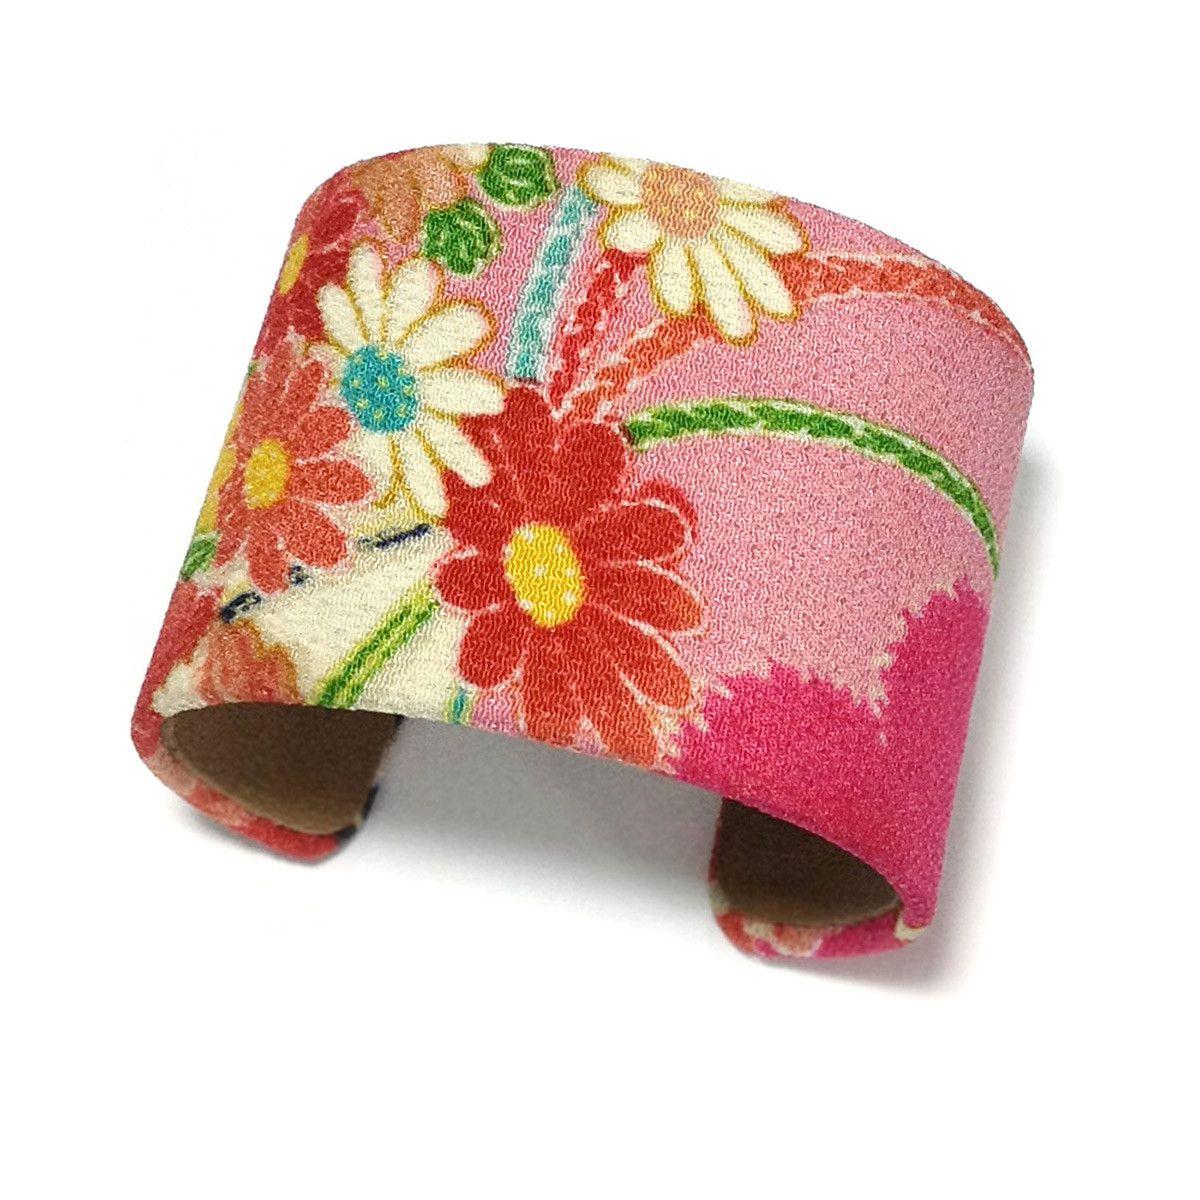 Kimono cuff dainty geisha maiko girl jewelry inspirations and